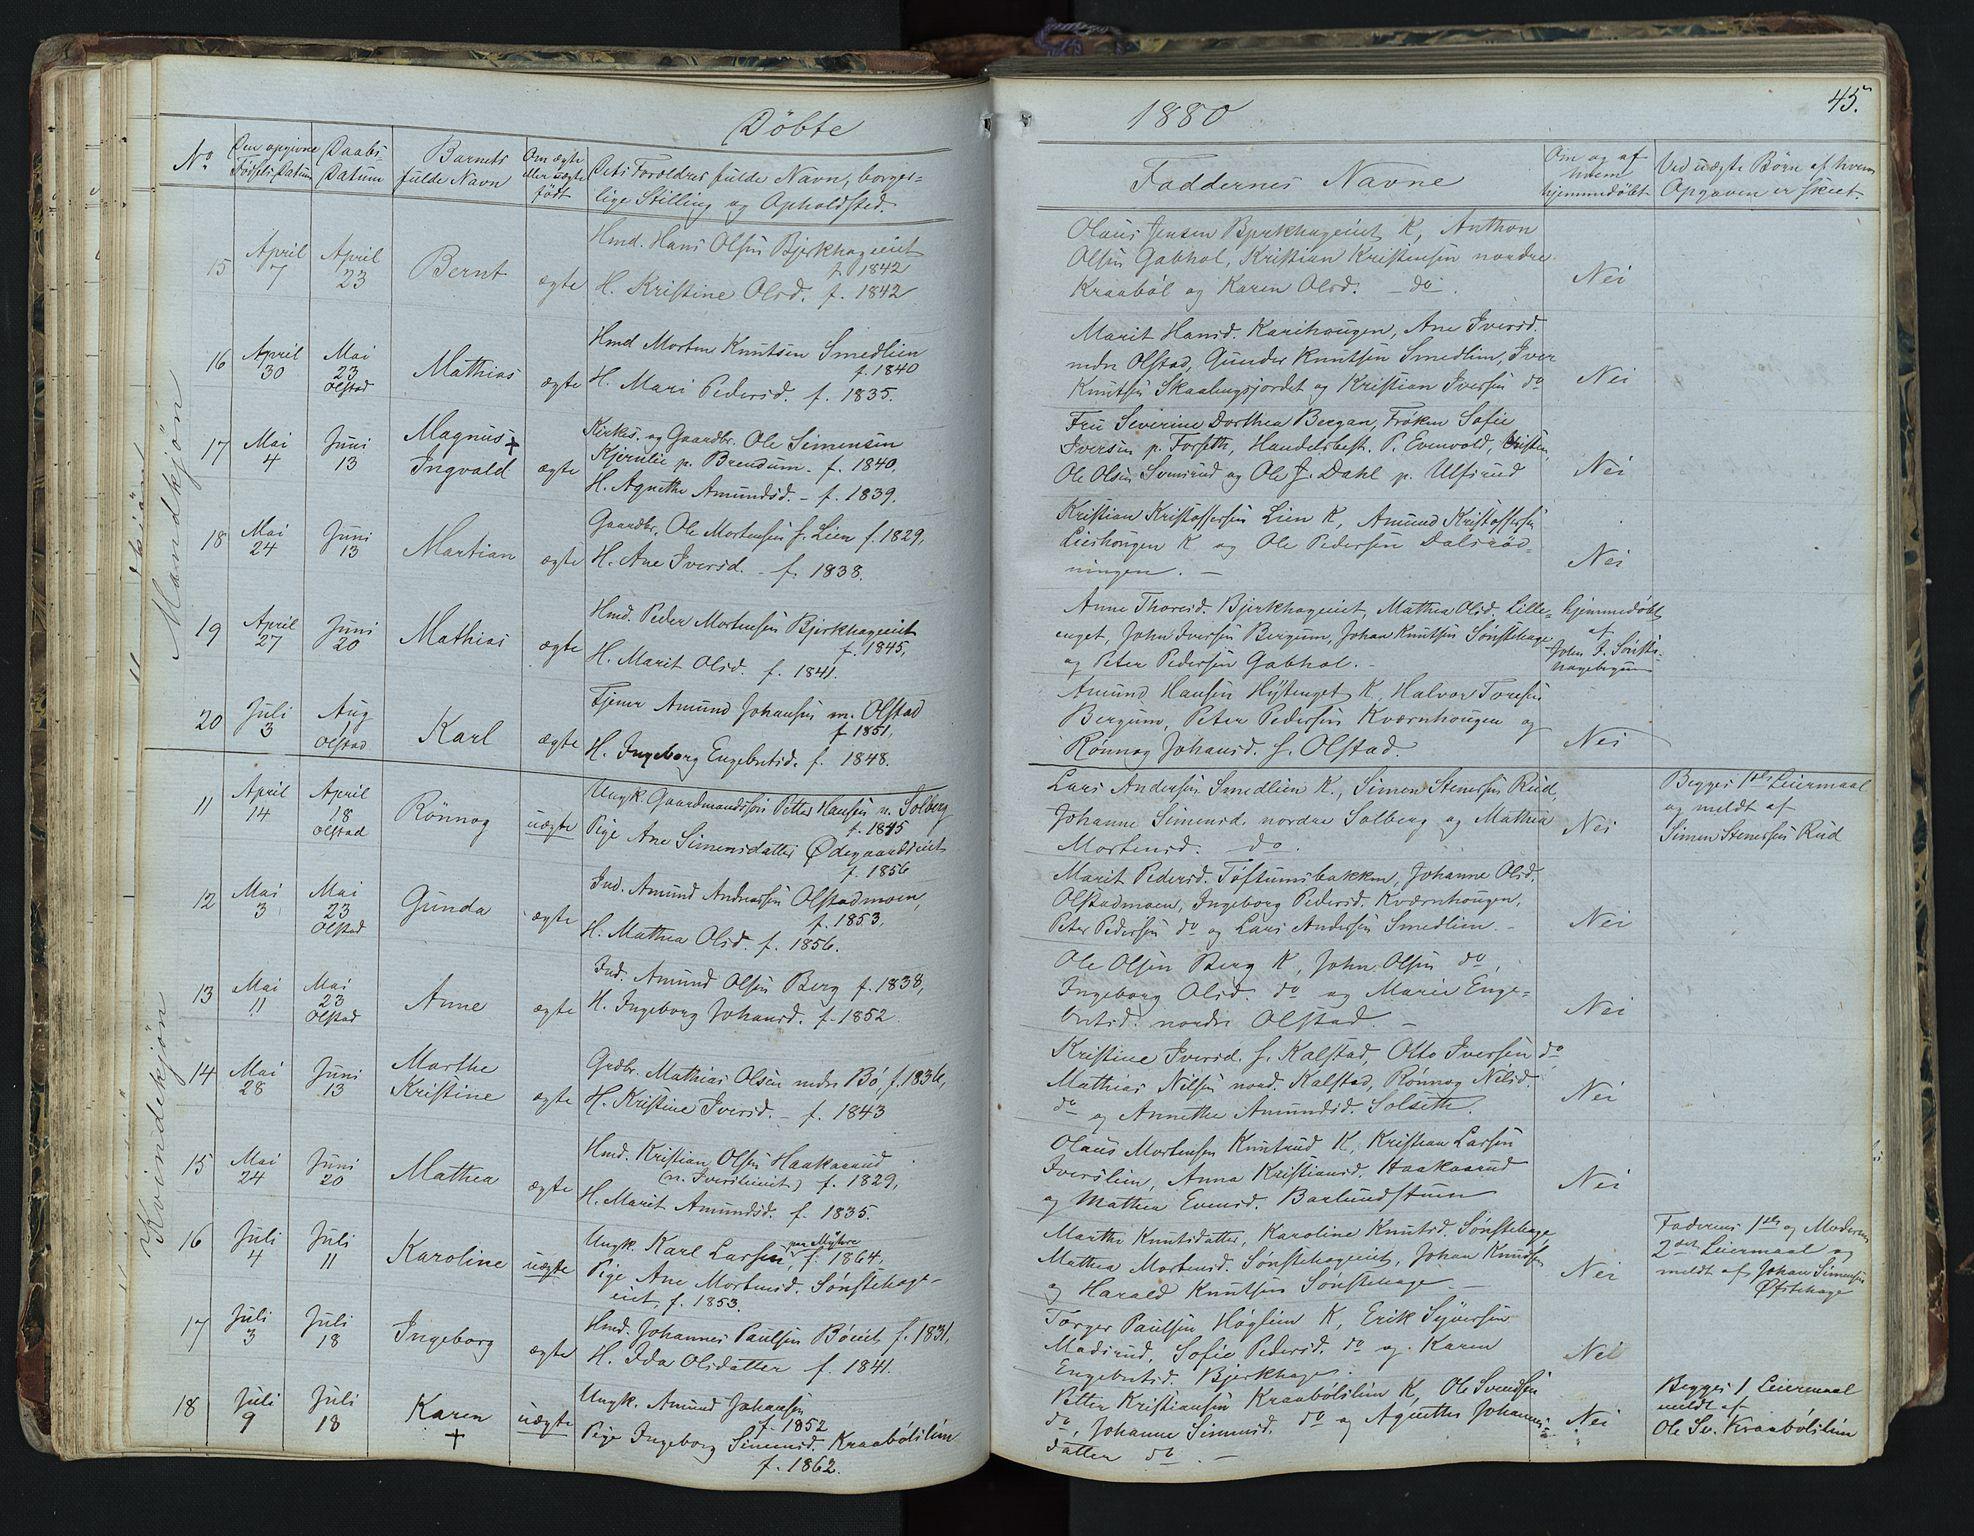 SAH, Vestre Gausdal prestekontor, Klokkerbok nr. 1, 1867-1895, s. 45